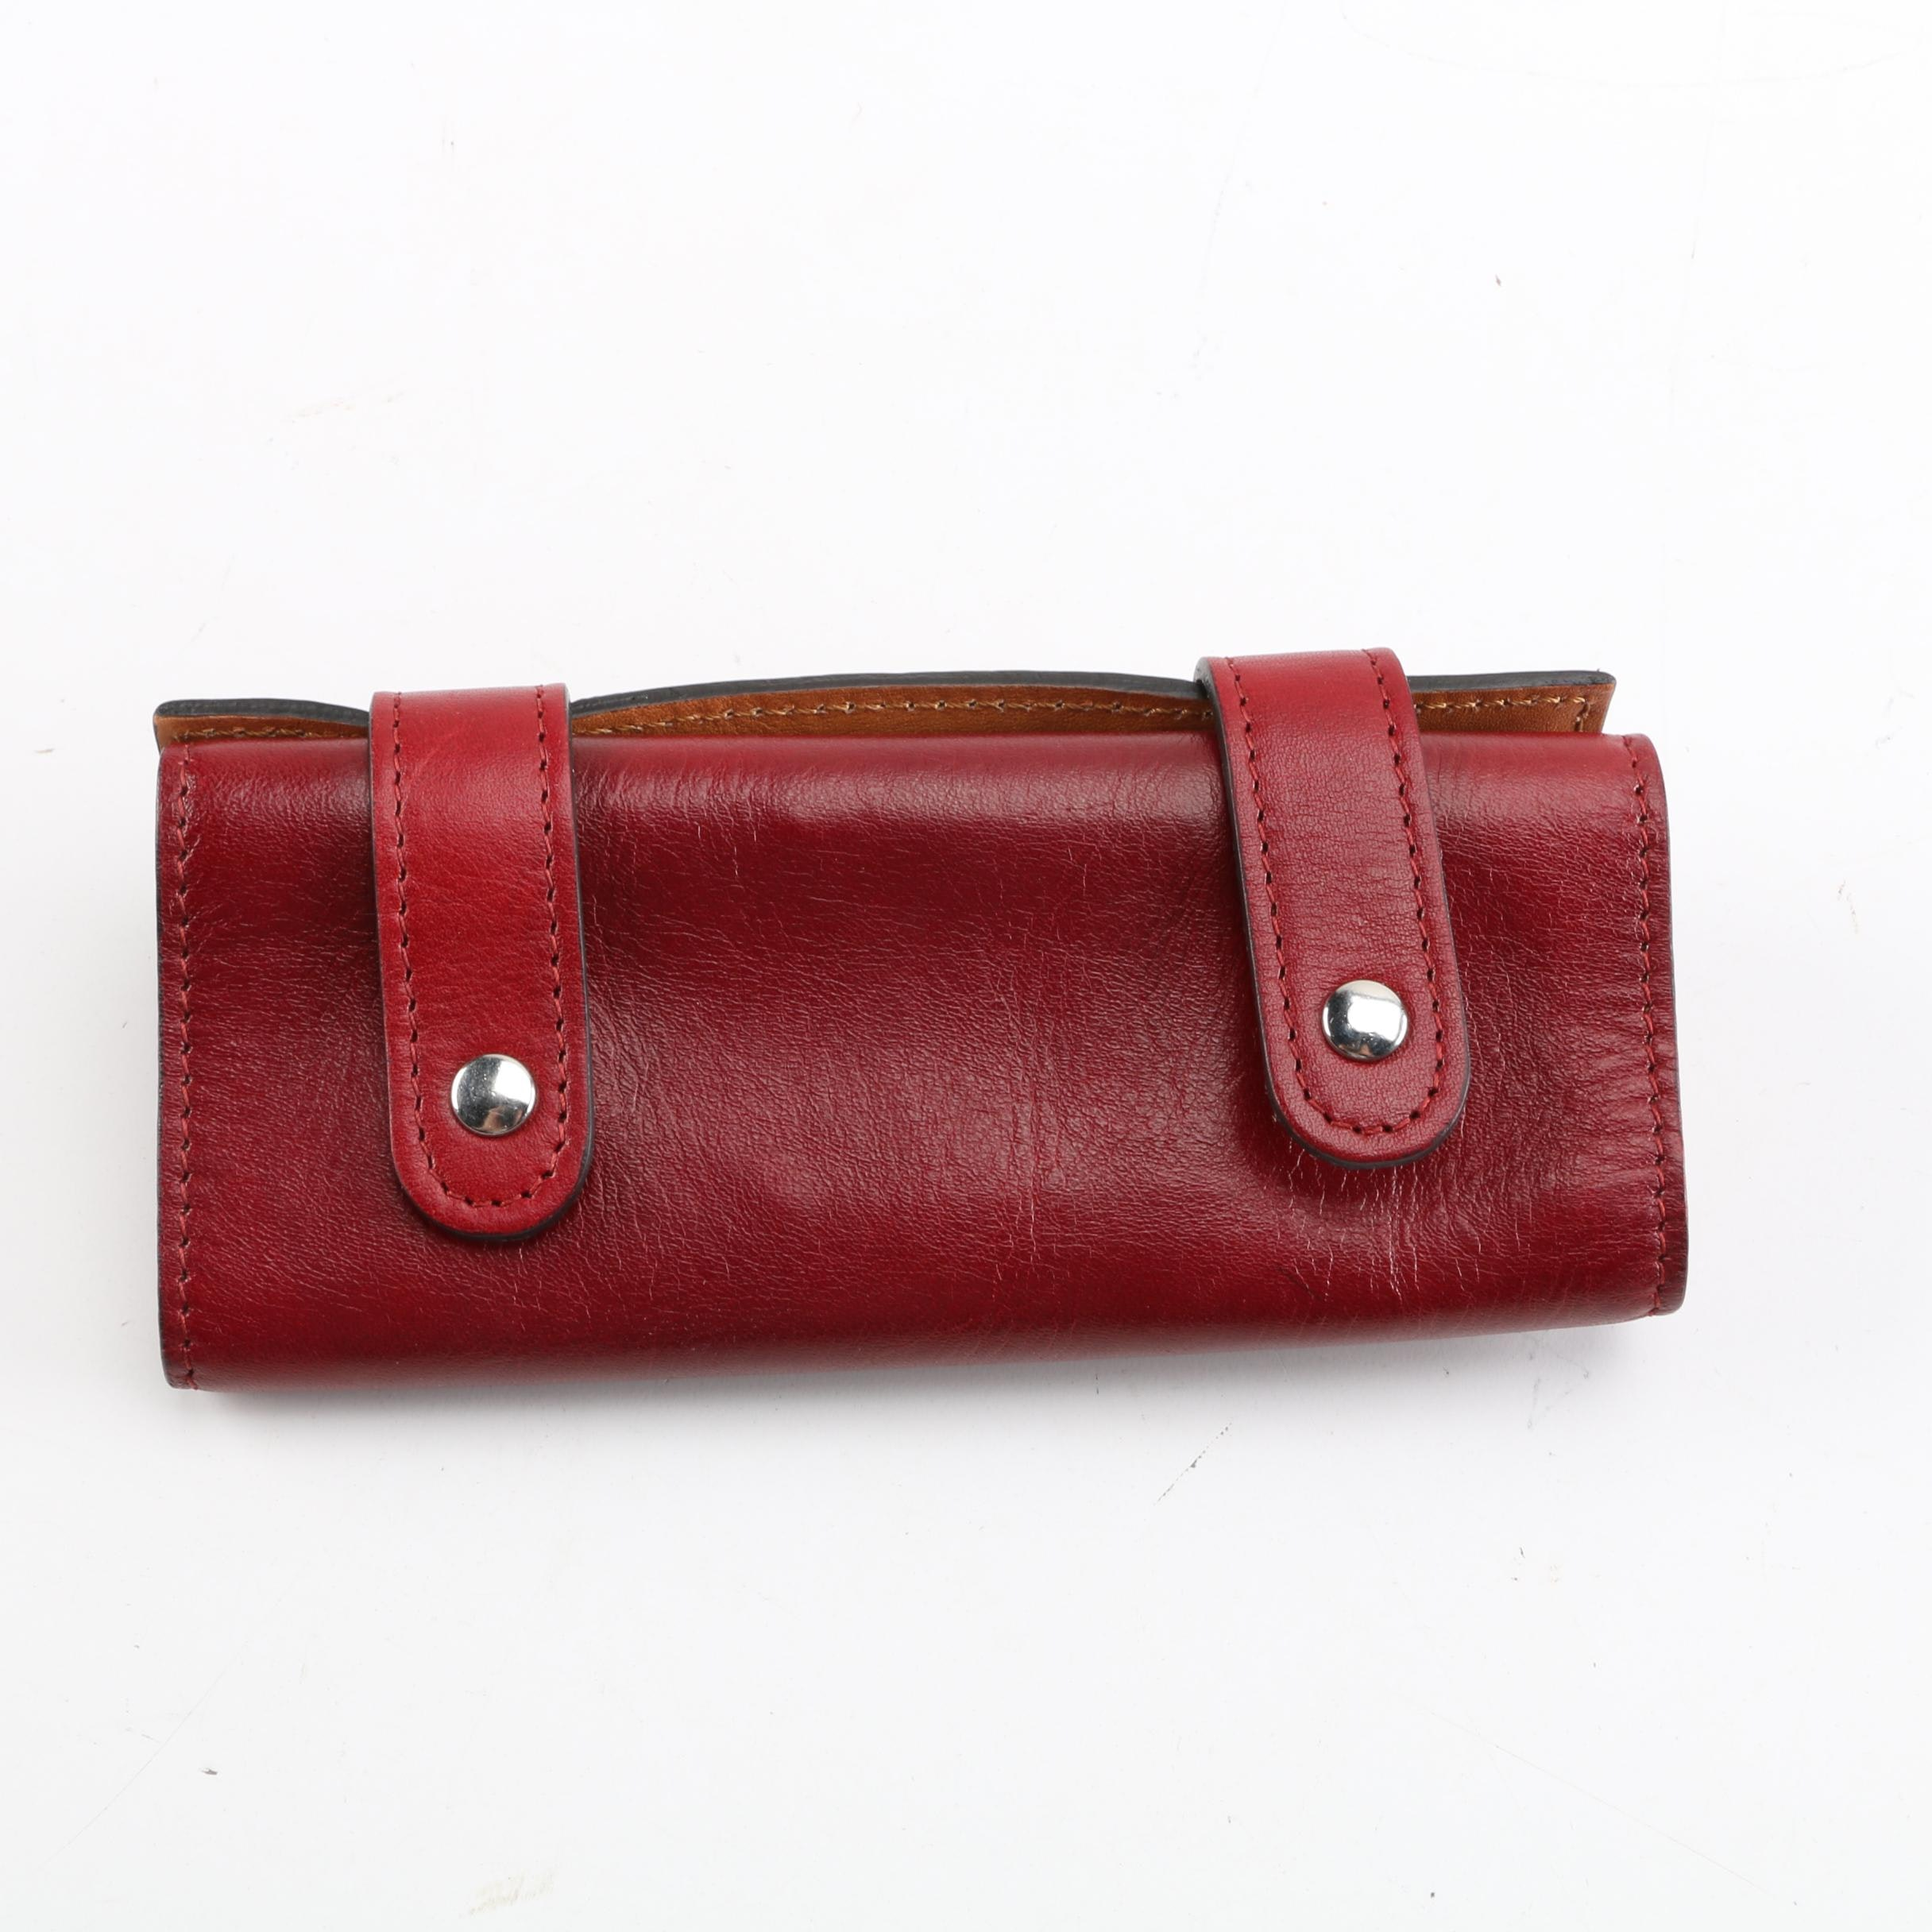 Old Angler Firenze Italian Leather Cigar Case